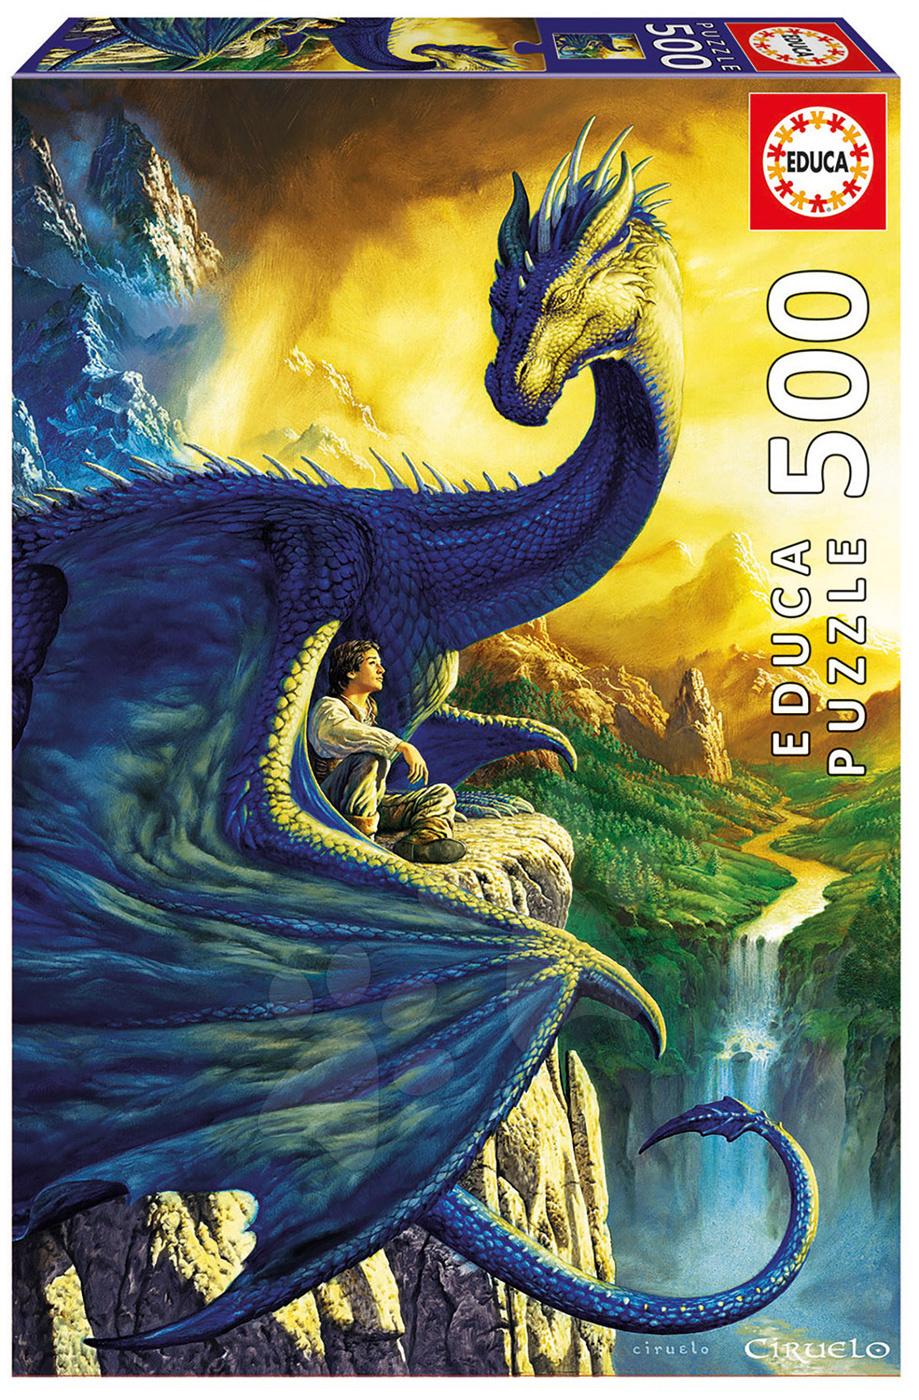 Puzzle Ciruelo Eragon a Saphira Educa 500 dílů od 11 let